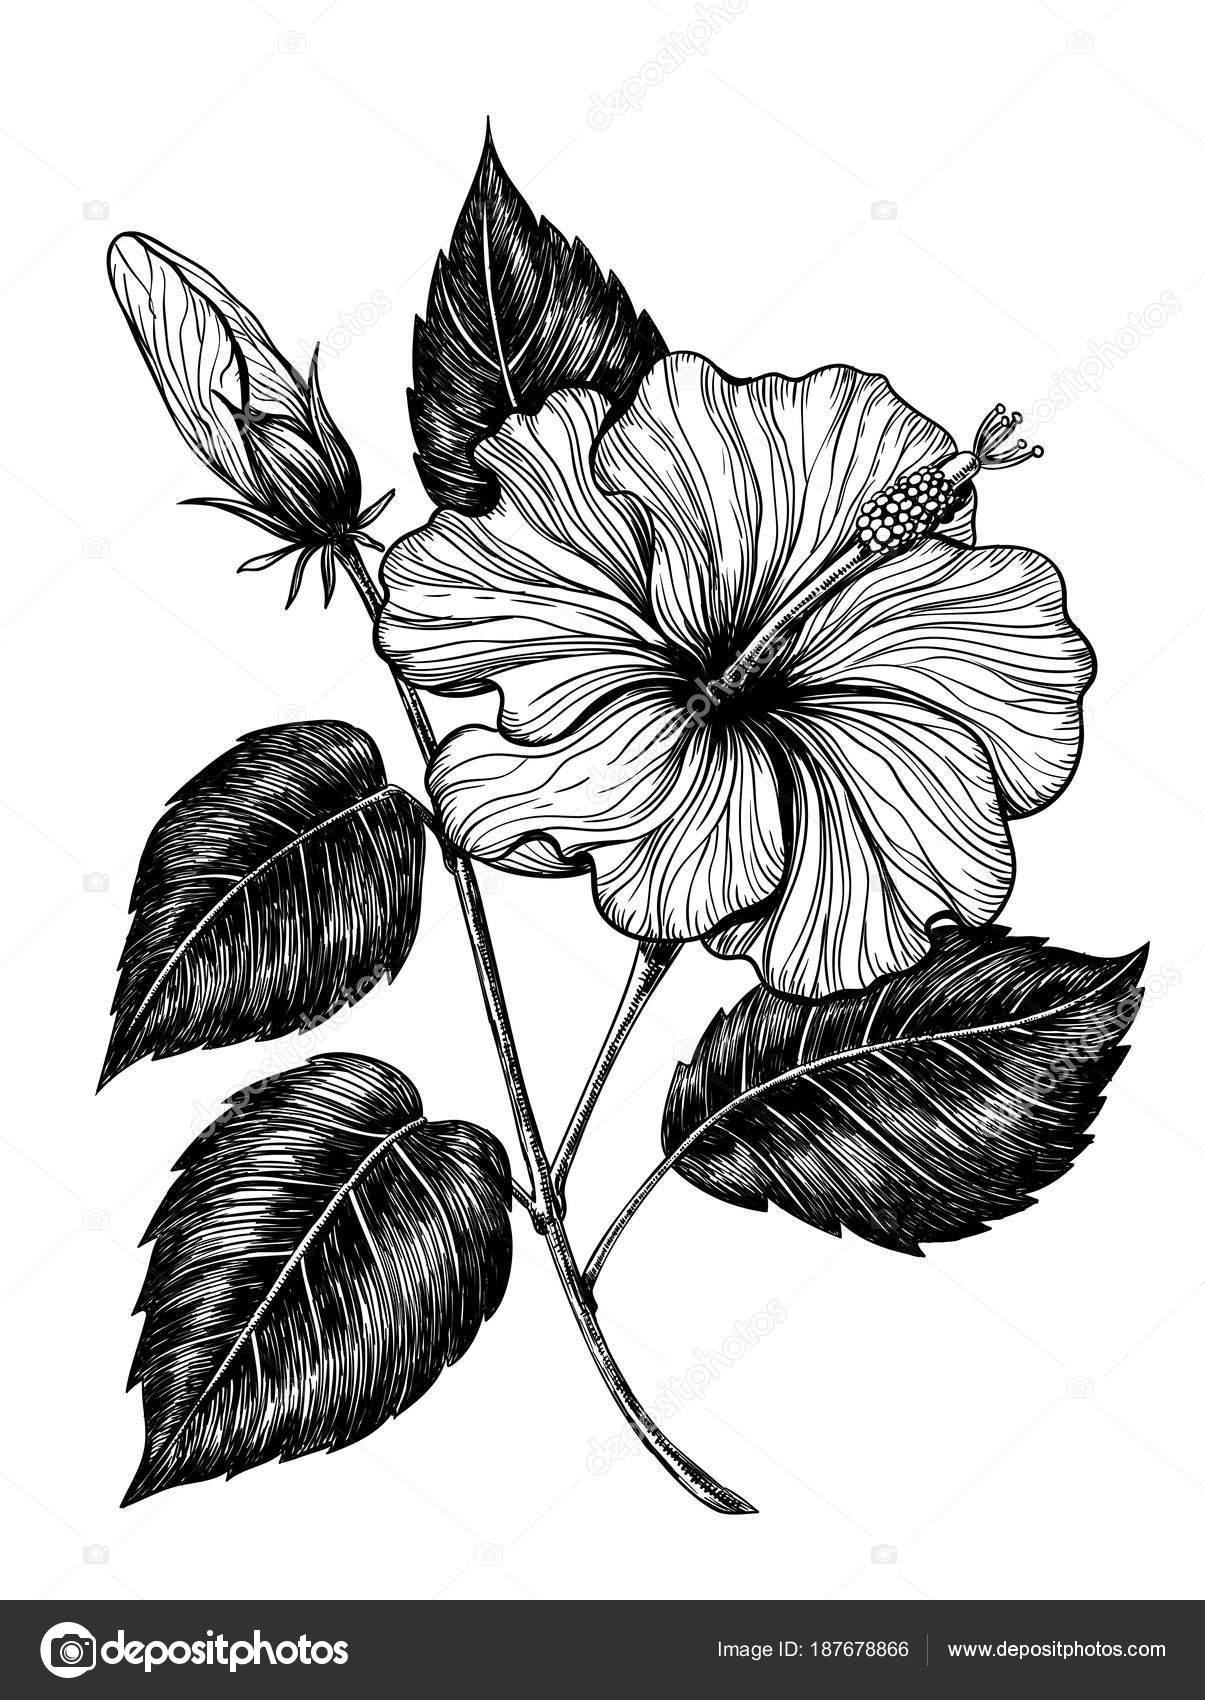 Hibiscus flower drawing stock vector katerinamk 187678866 hibiscus flower drawing stock vector izmirmasajfo